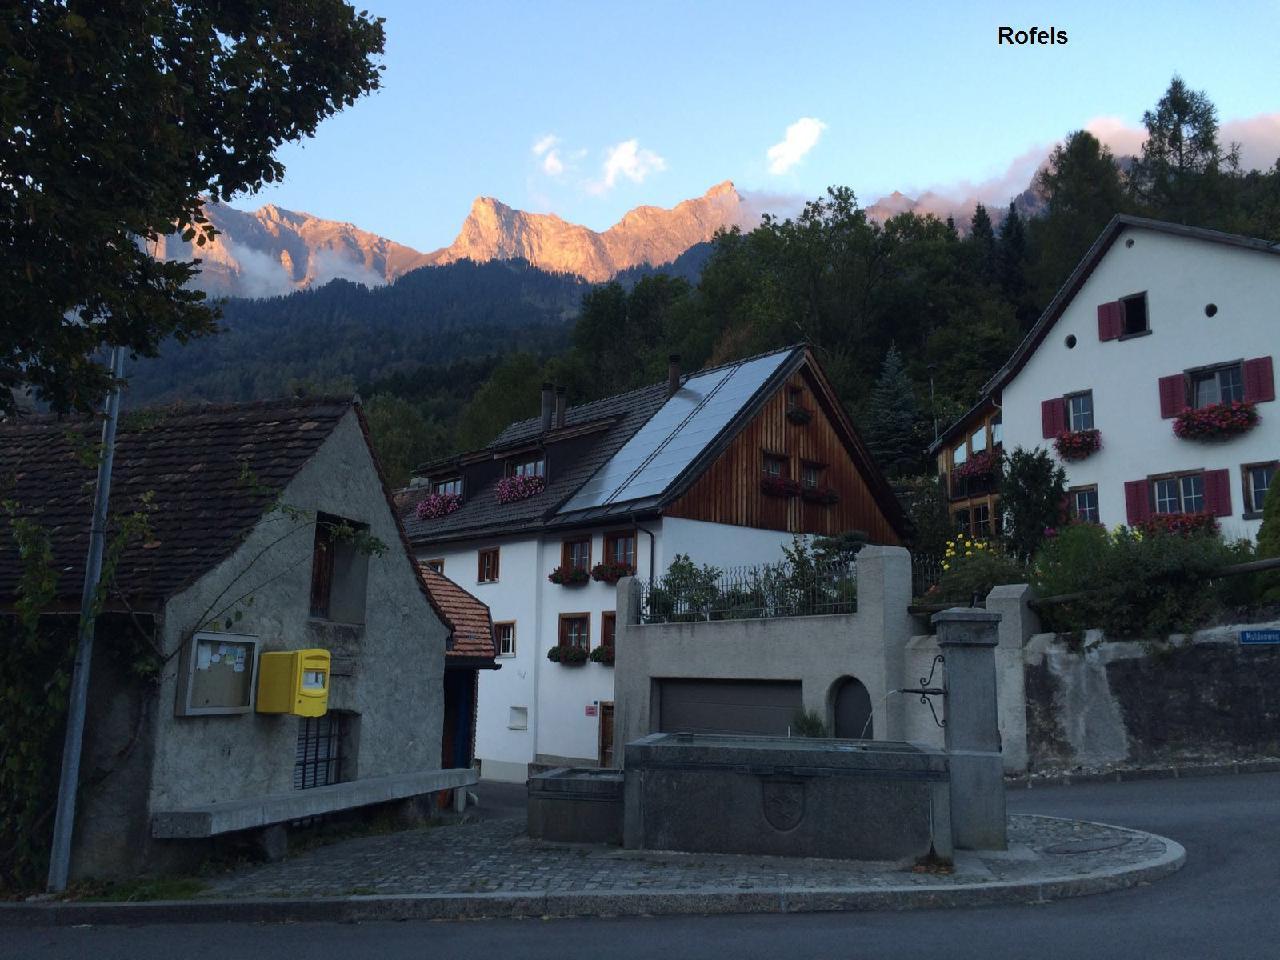 Maison de vacances Heidihuus - Ferienhaus*** im sonnigen Heidiland (817543), Maienfeld, Pays d'Heidi, Suisse Orientale, Suisse, image 17